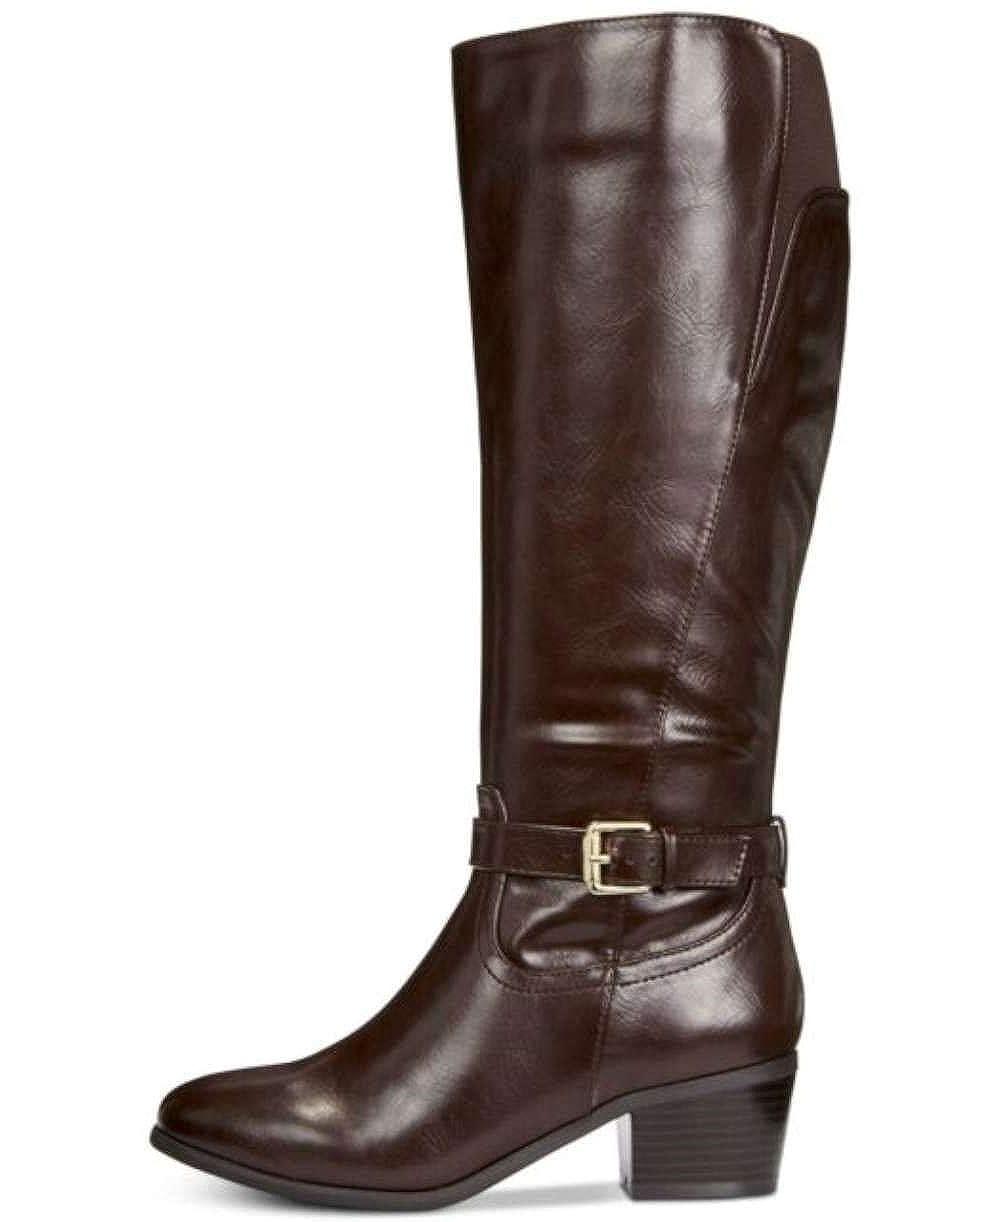 Dk Brown Karen Scott KS35 Fayth Below The Knee Riding Boots, Black